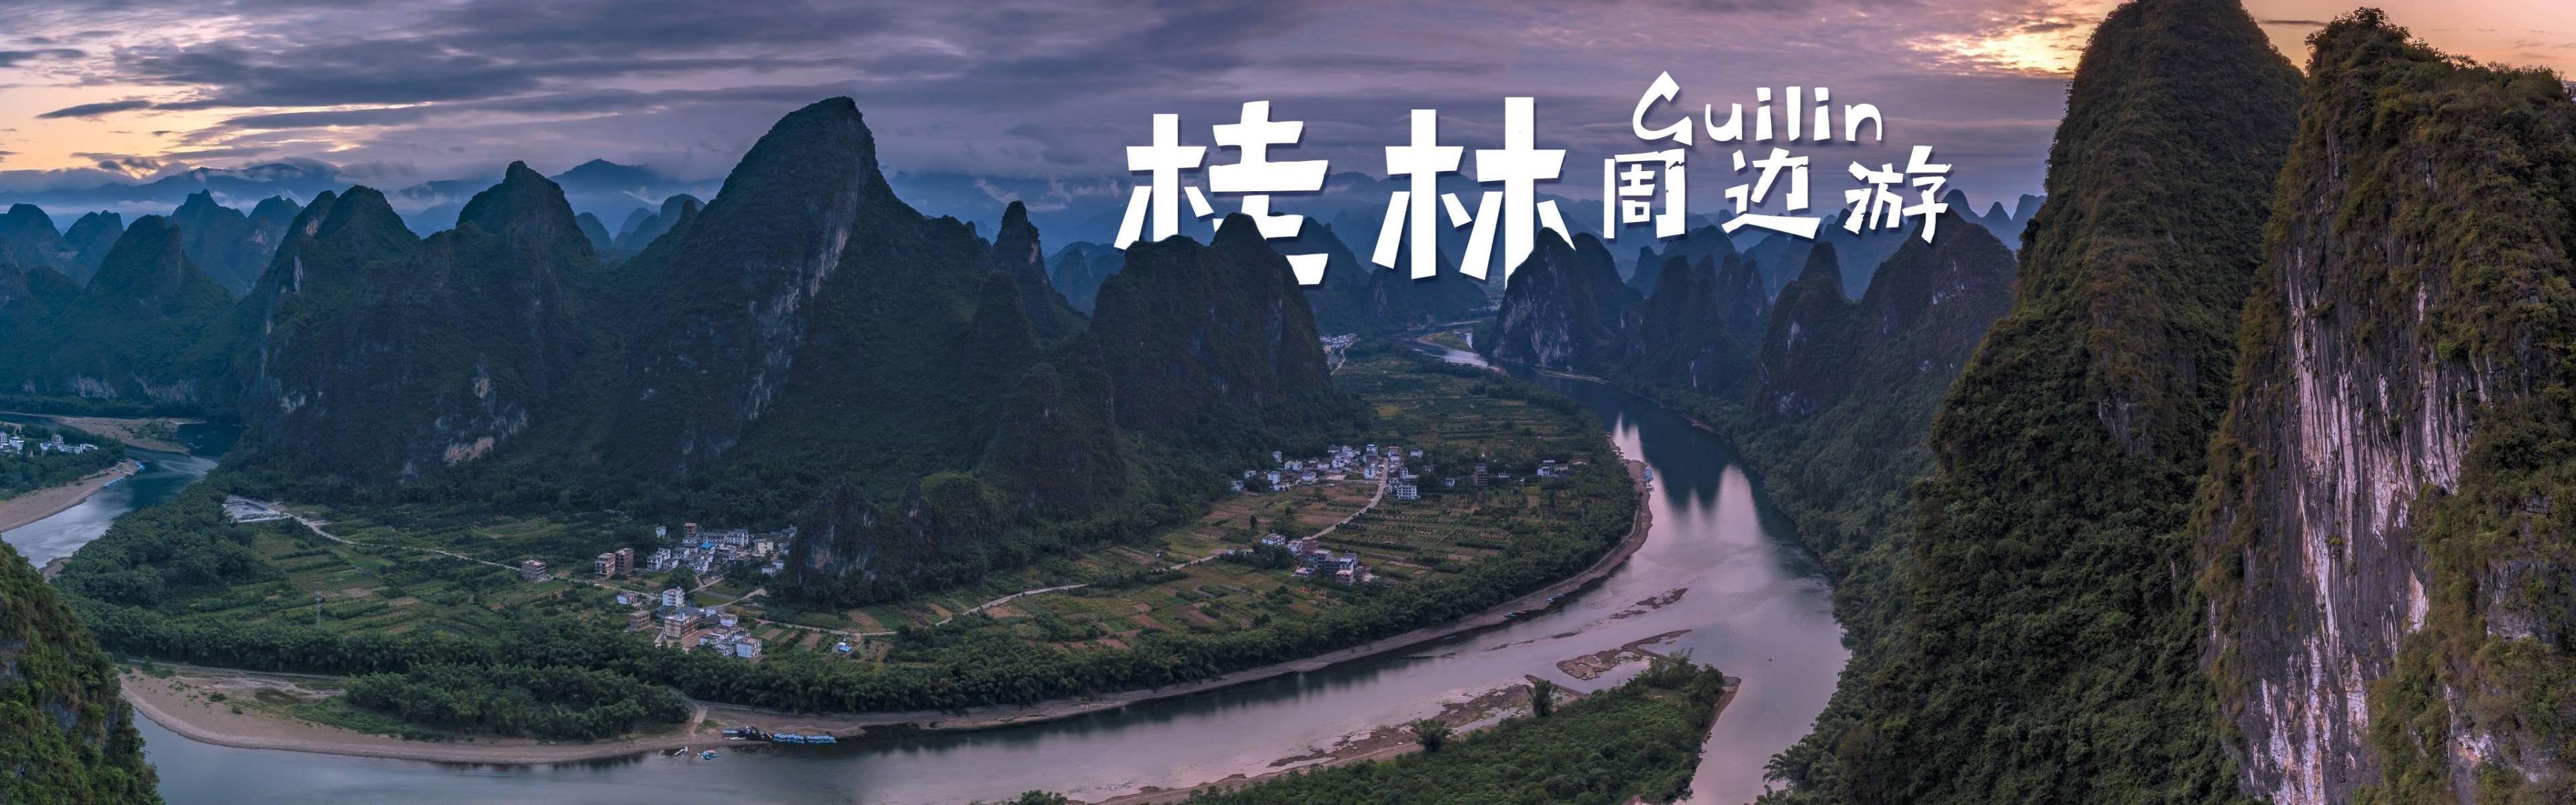 桂林周边游